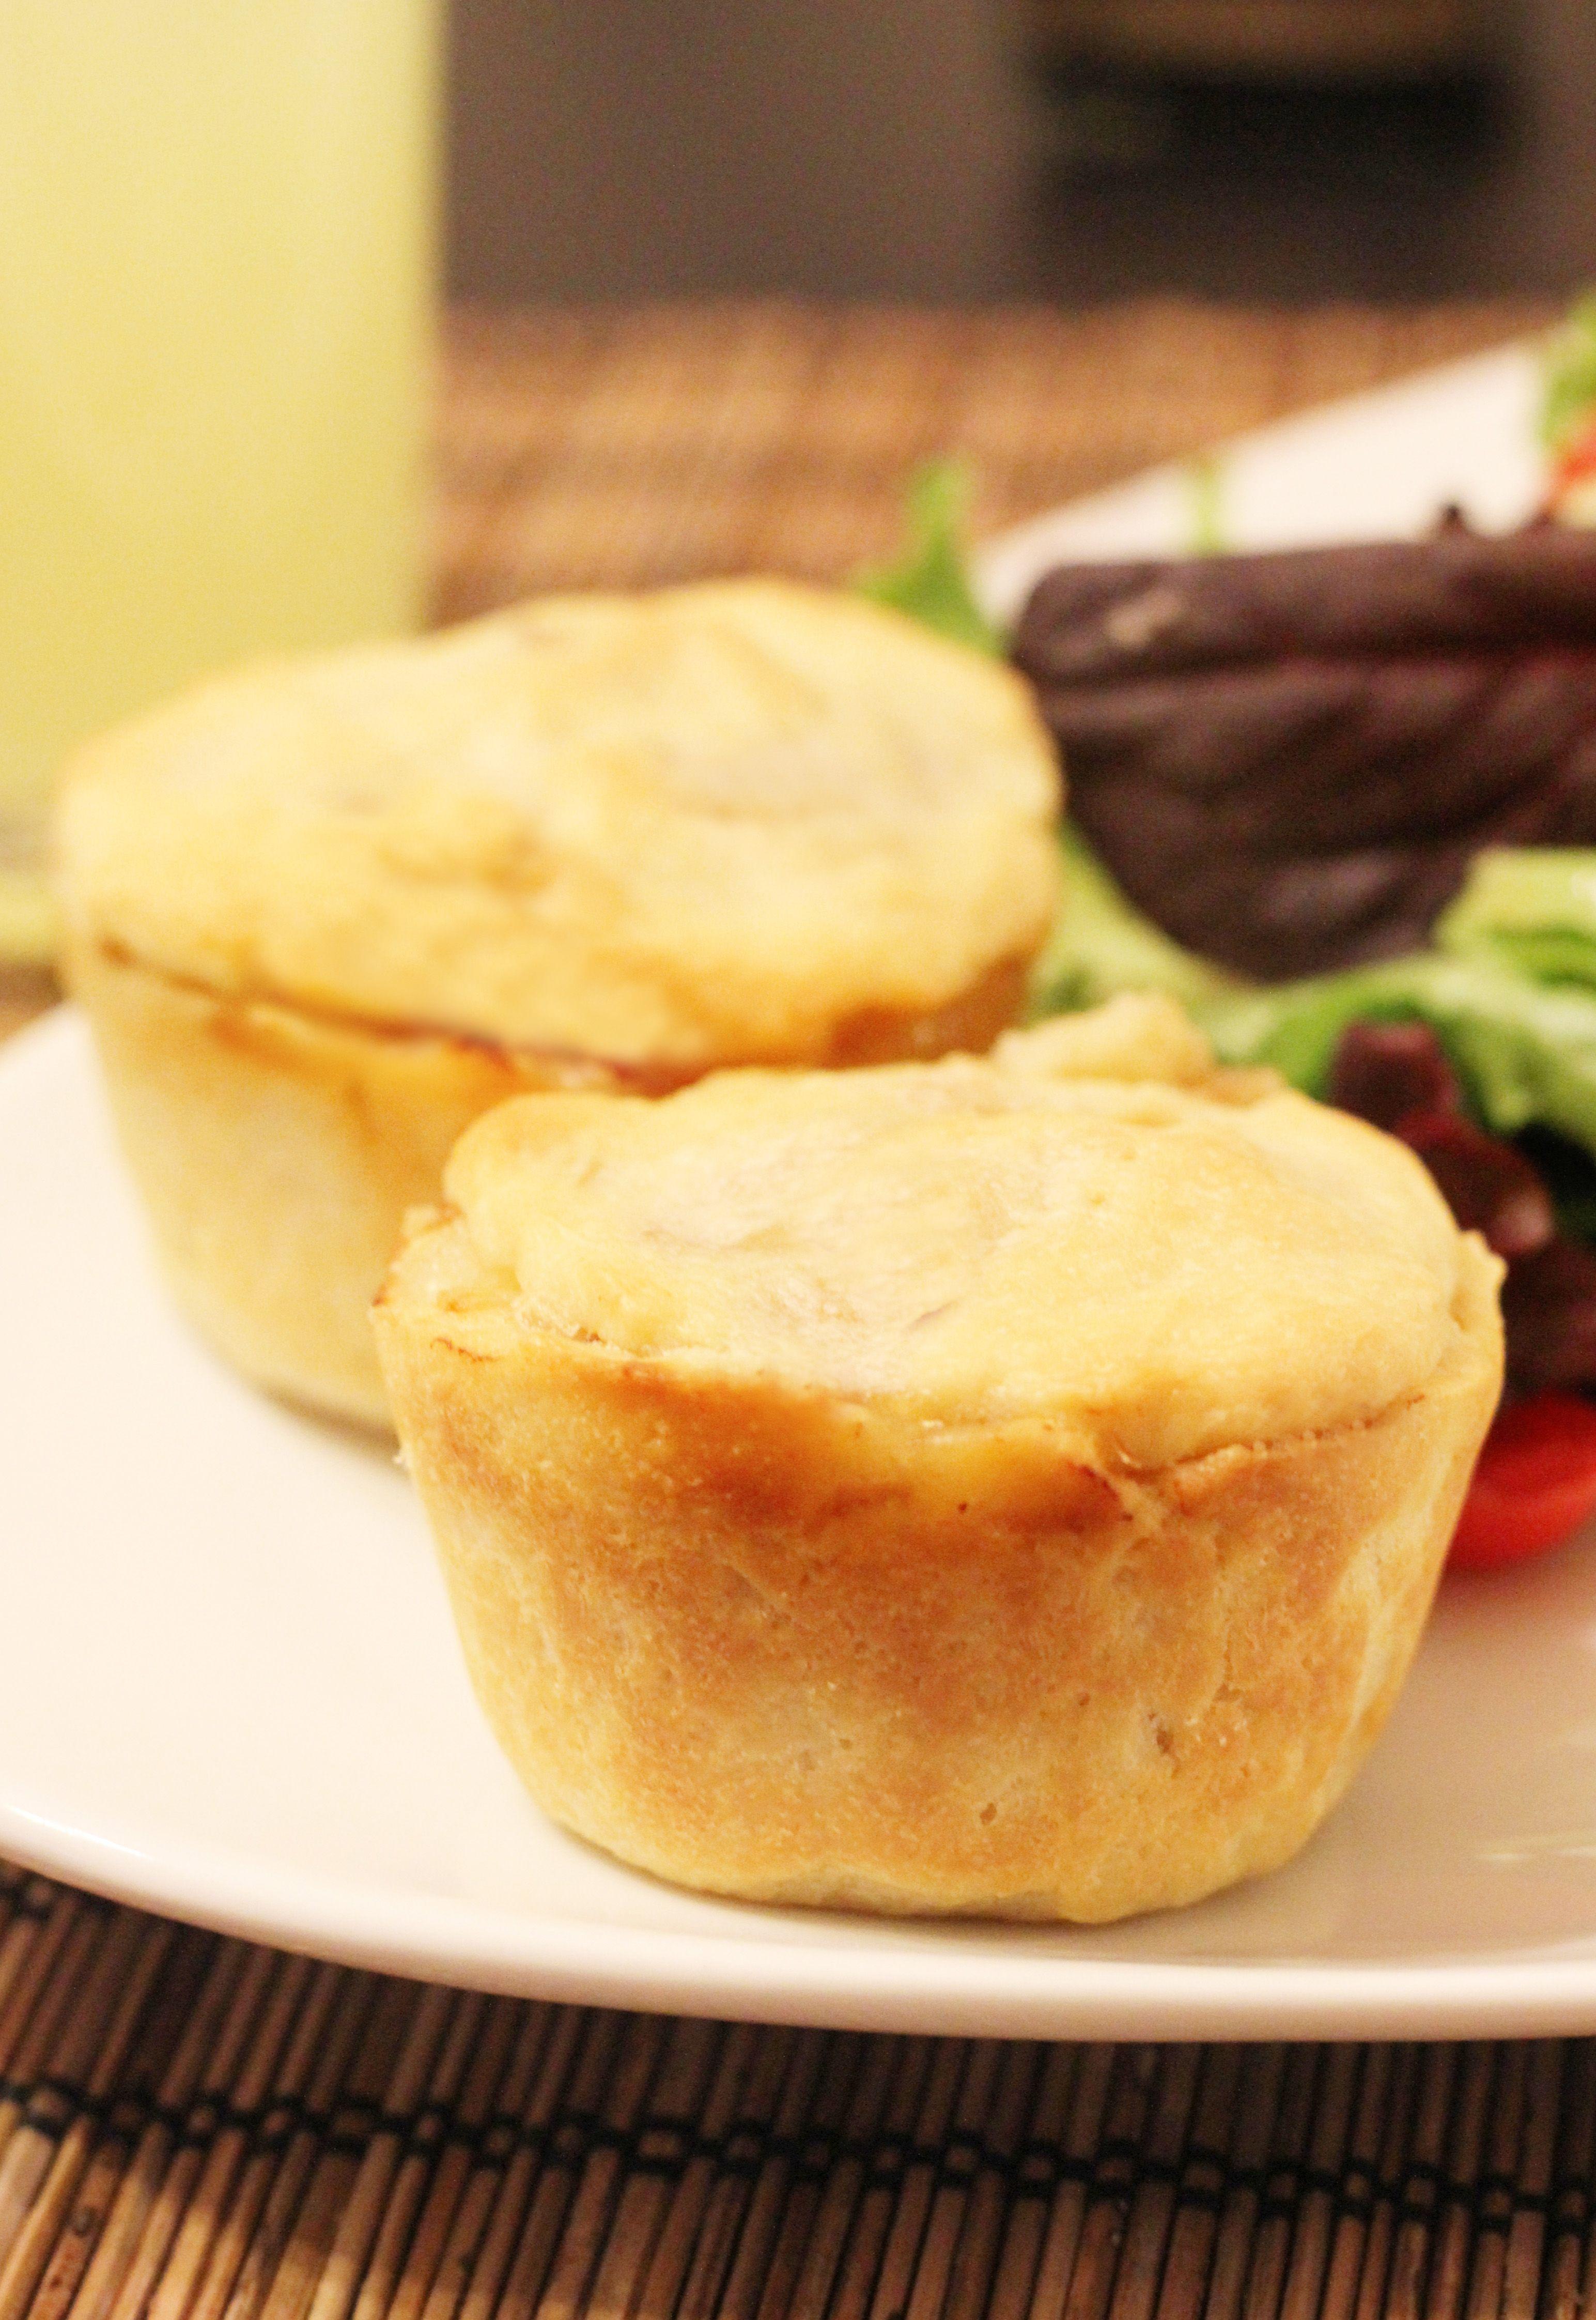 Mini Potato Pies. Find the recipe here: http://fahrenbite.wordpress.com/2012/06/04/mini-potato-pies/